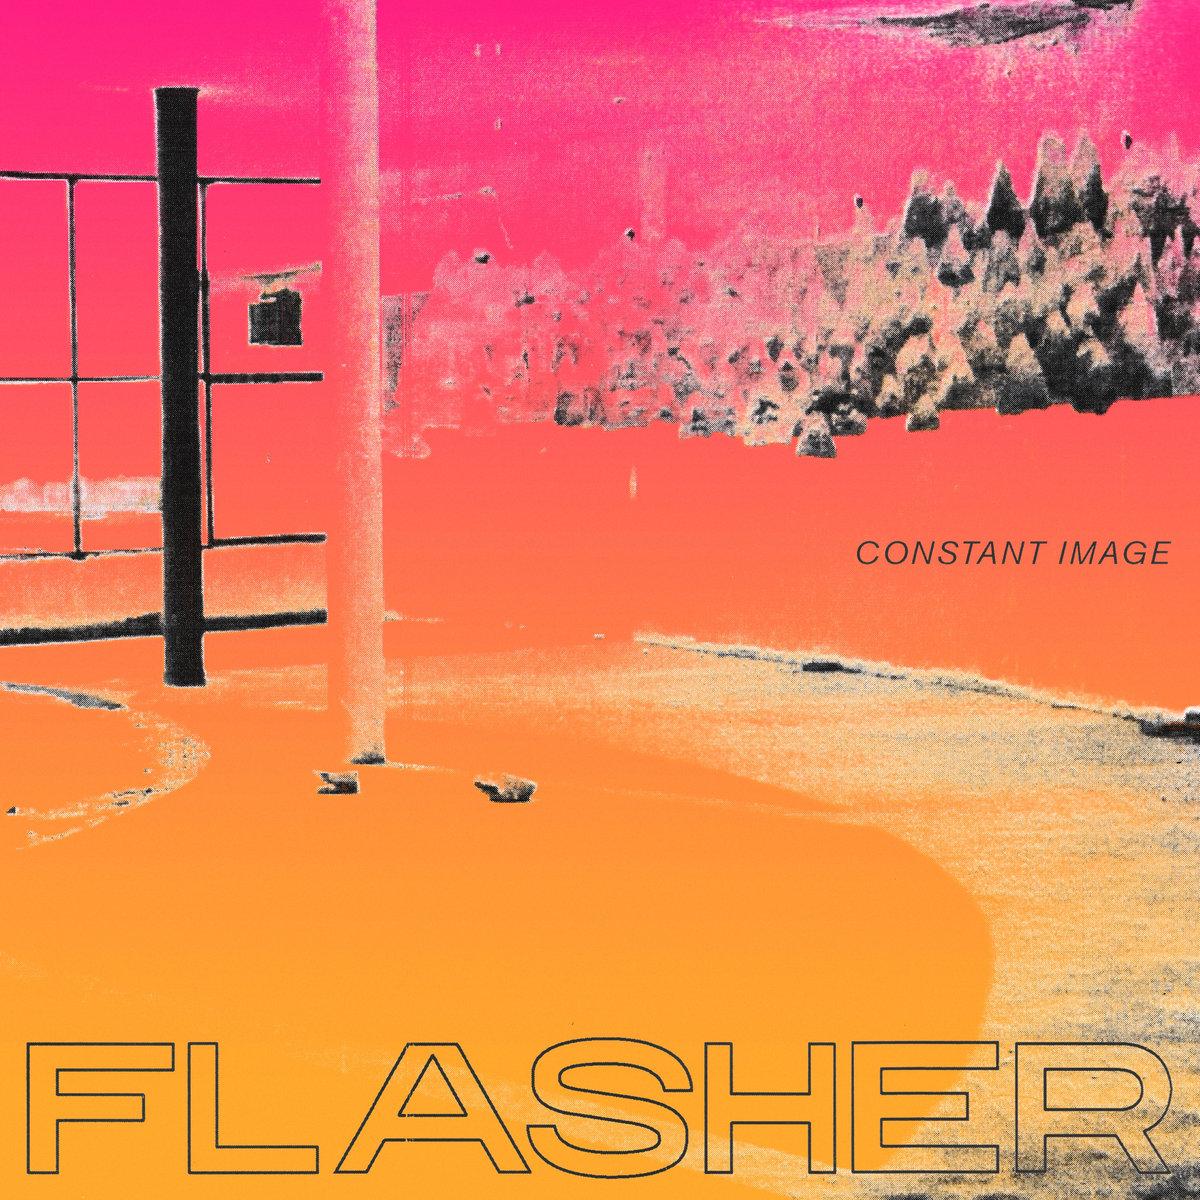 Constant Image  Flasher   LINKS   Bandcamp   Facebook   Instagram    LISTEN ON   Spotify   Apple Music